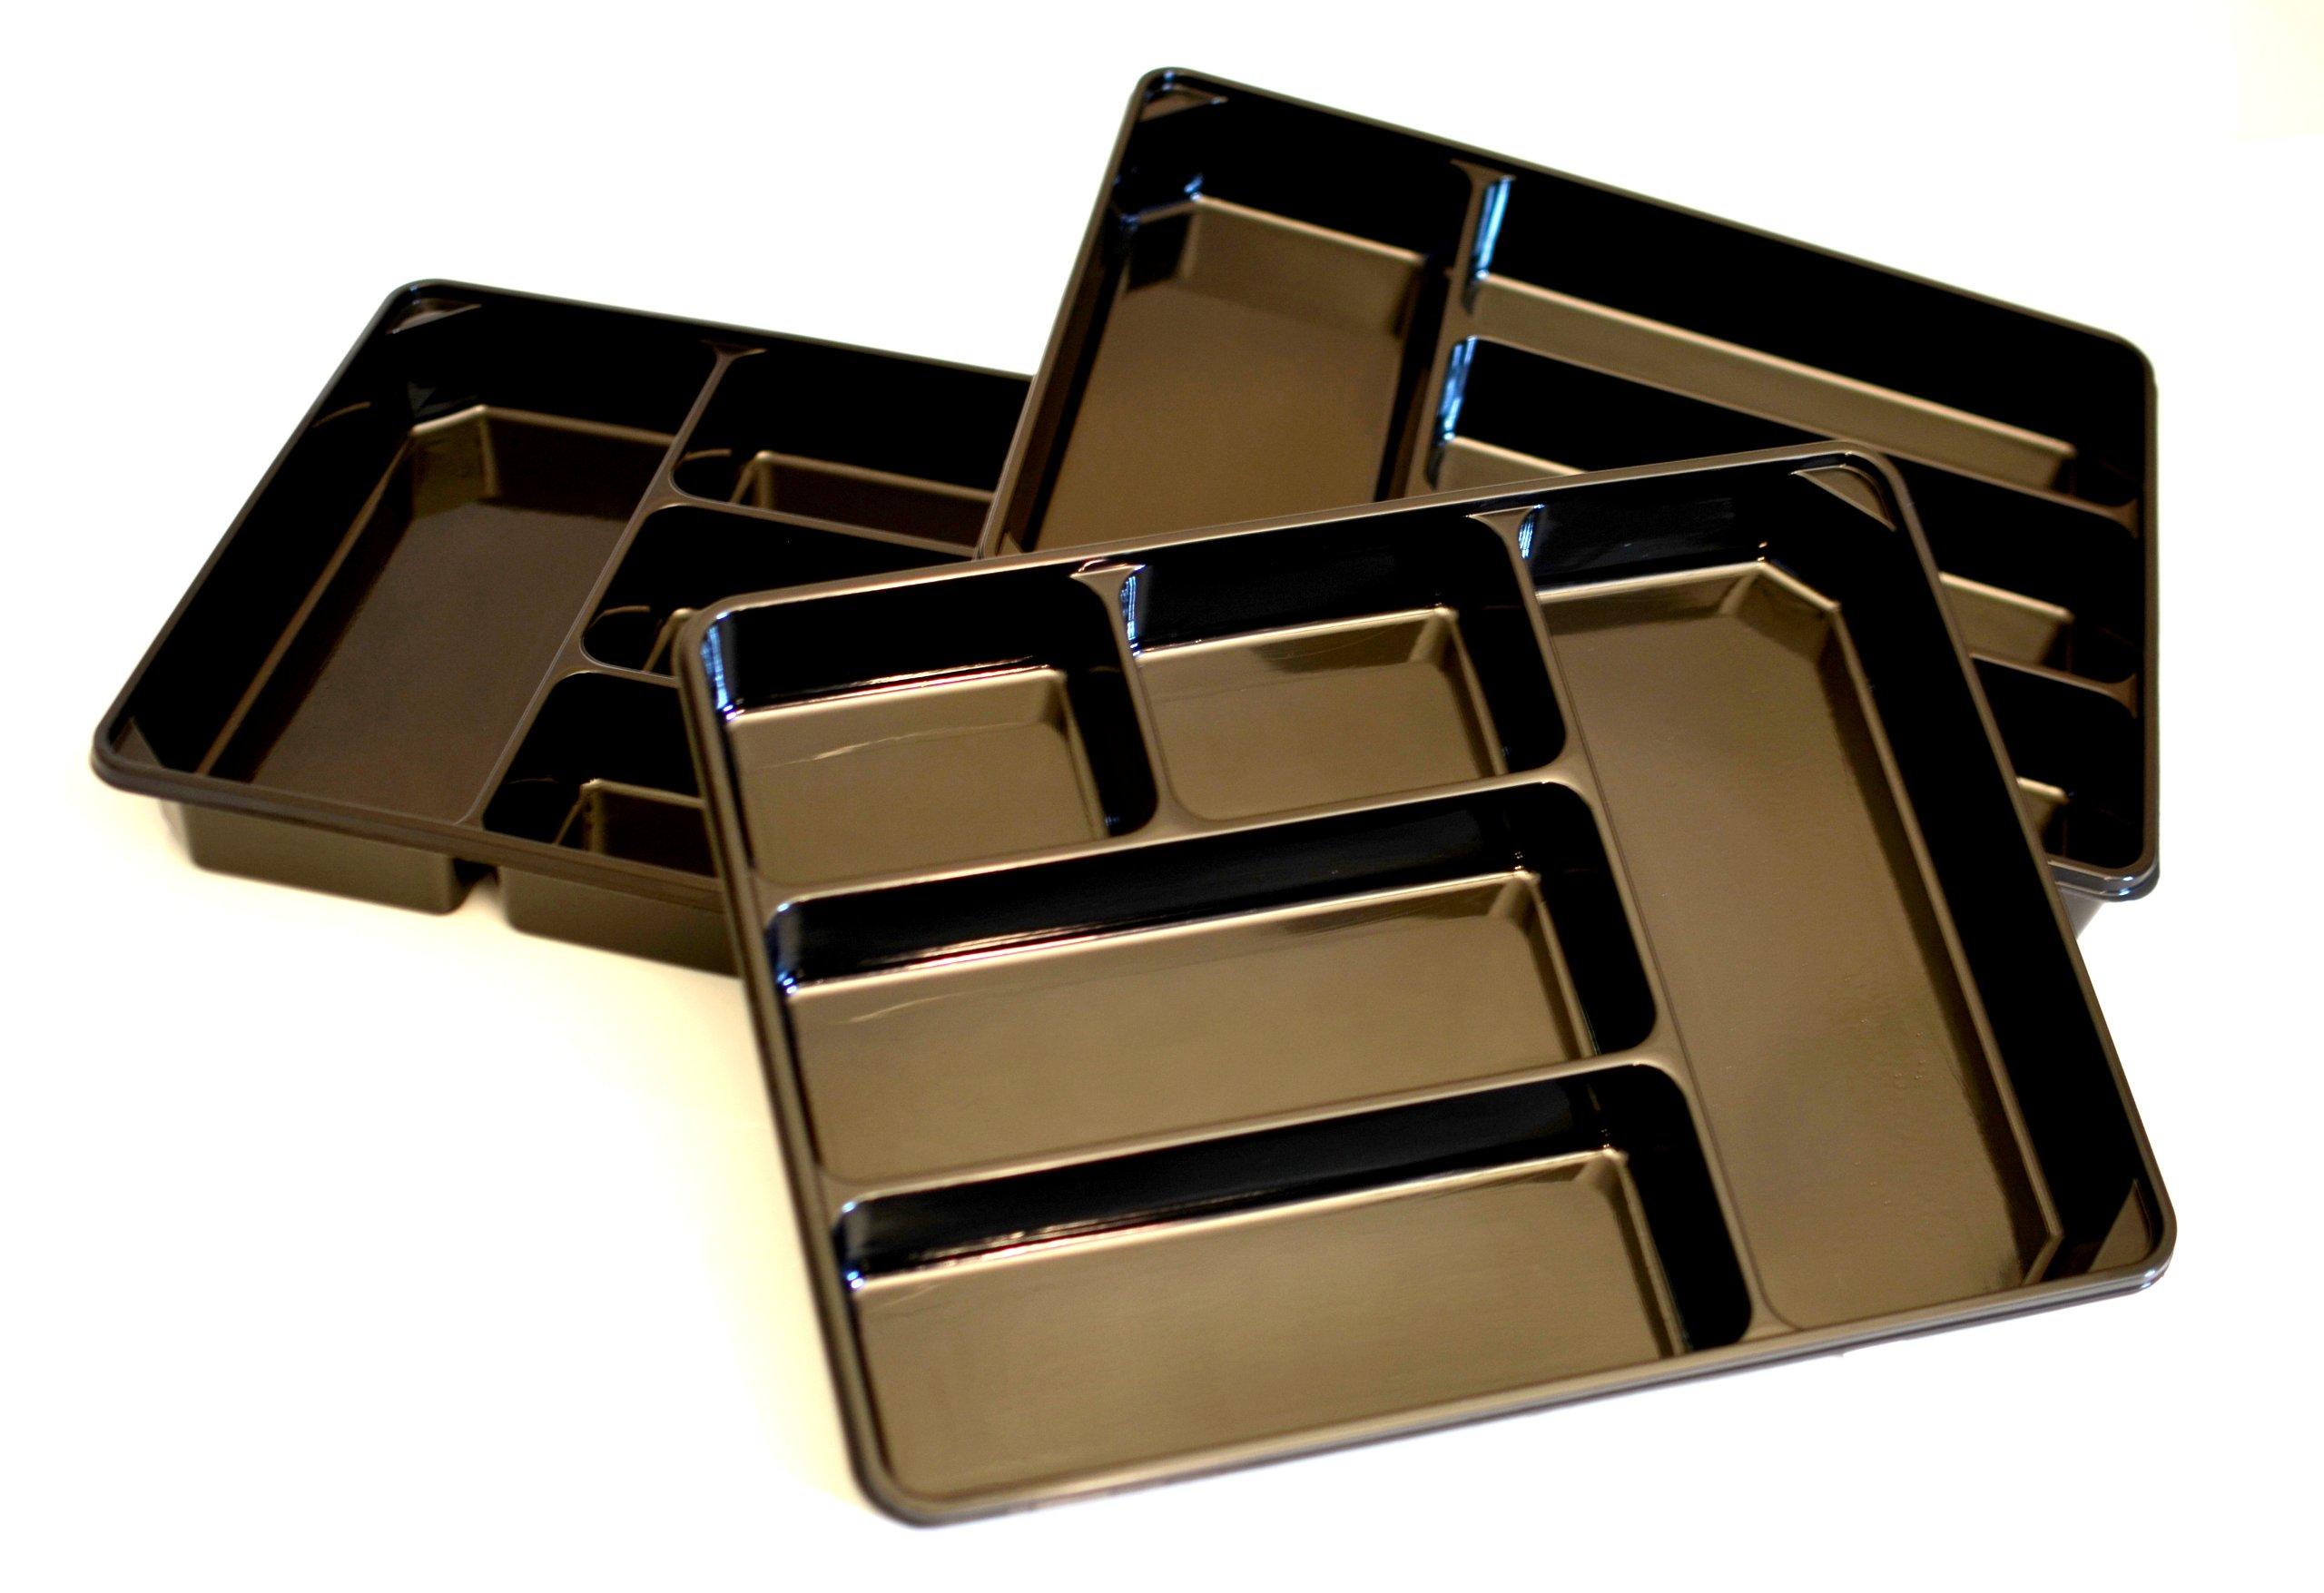 3-PACK of Organizer Trays for Desk, Utensils, Tools, Crafts, Vanity - 15.7'' x 11.7'' x 2.0'' - Black